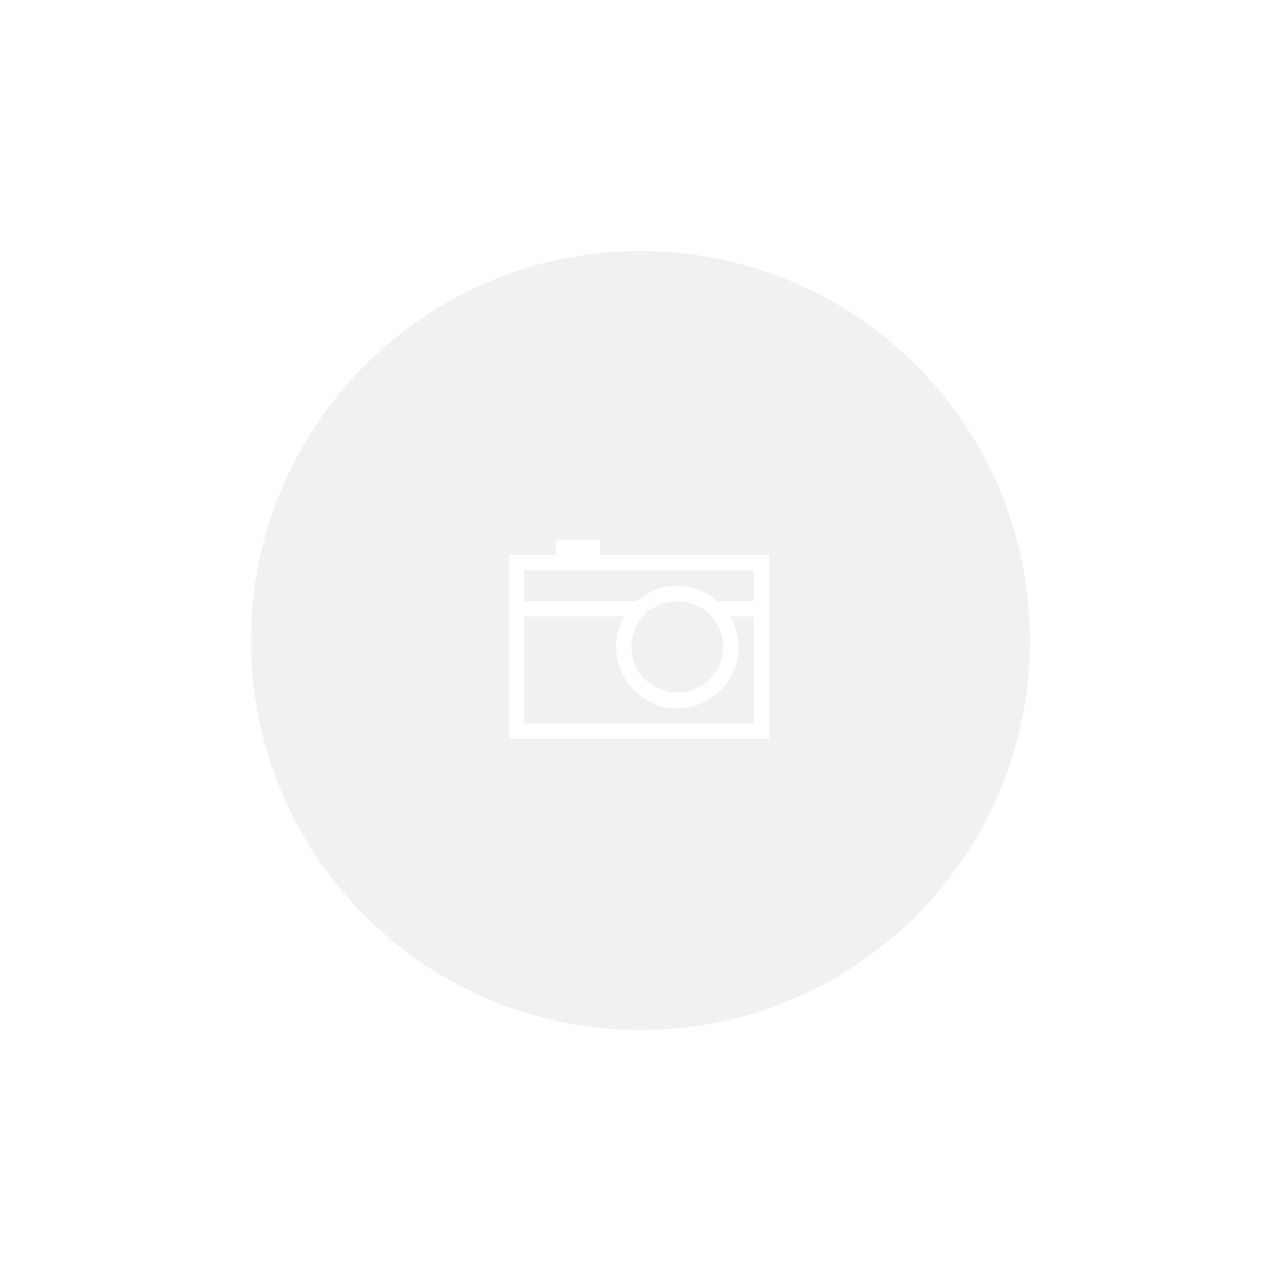 Óleo Lubrificante de Lâminas de Tosa - Lidere 500ml